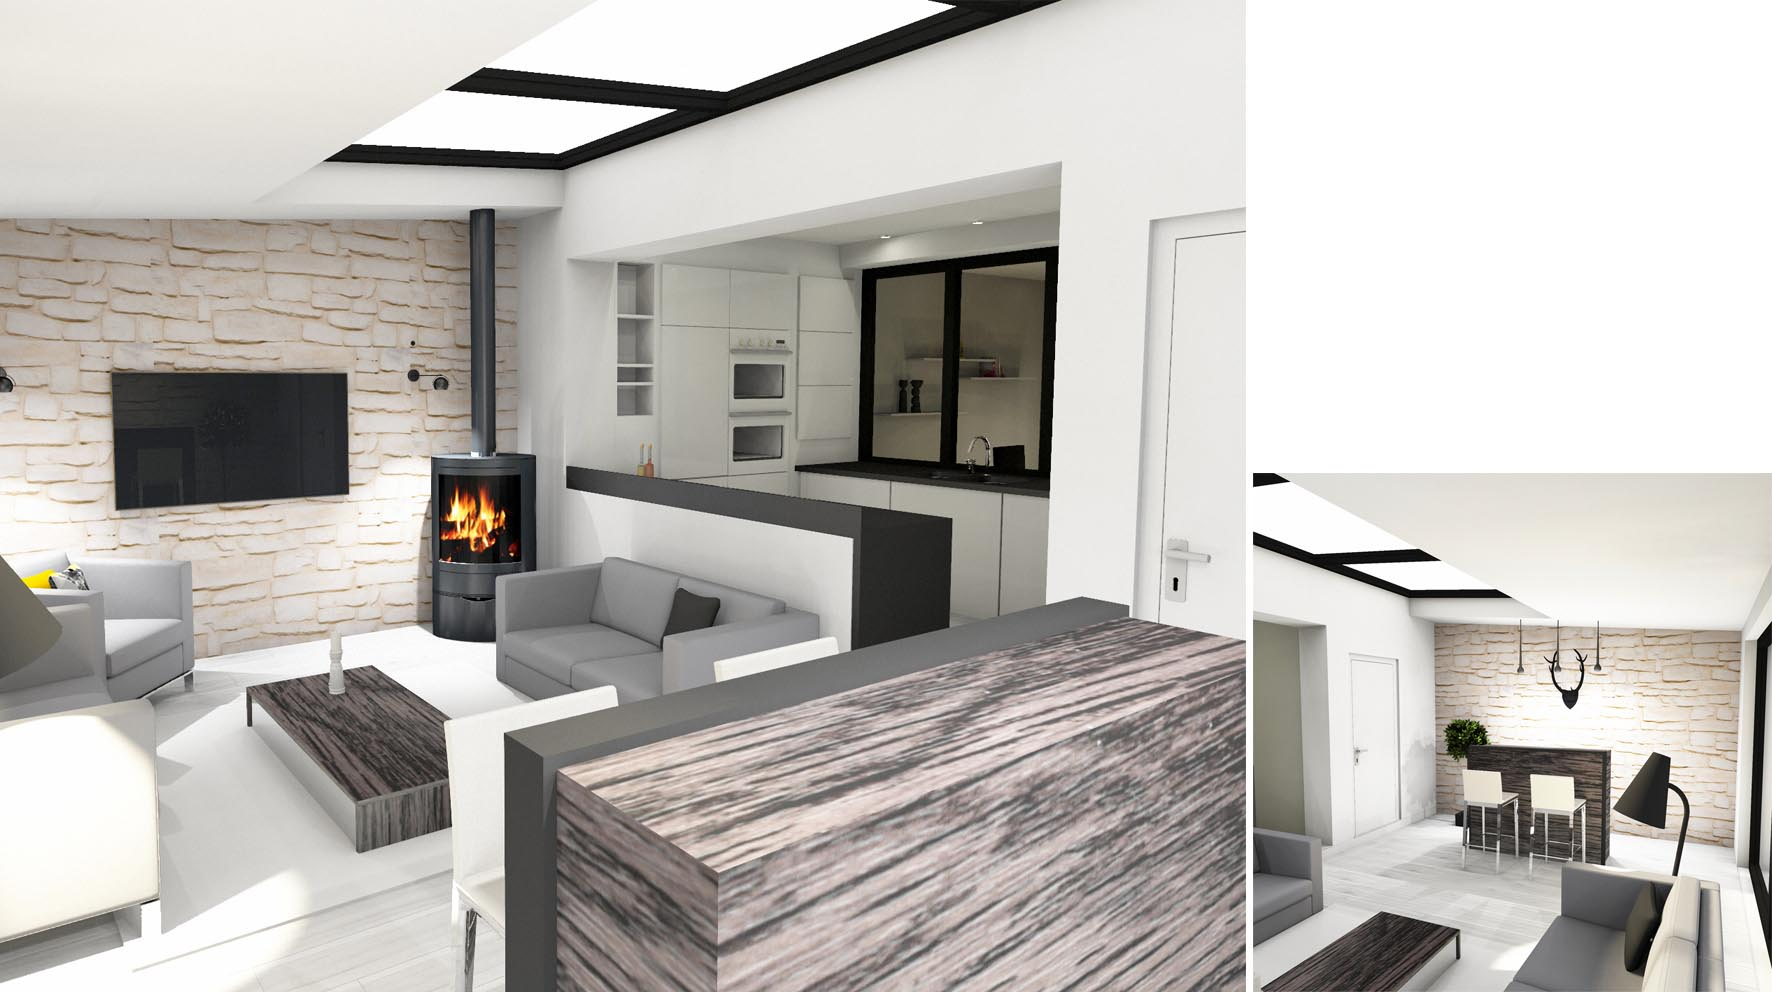 home staging maison boddaert interieur architecte interieur lille nord. Black Bedroom Furniture Sets. Home Design Ideas